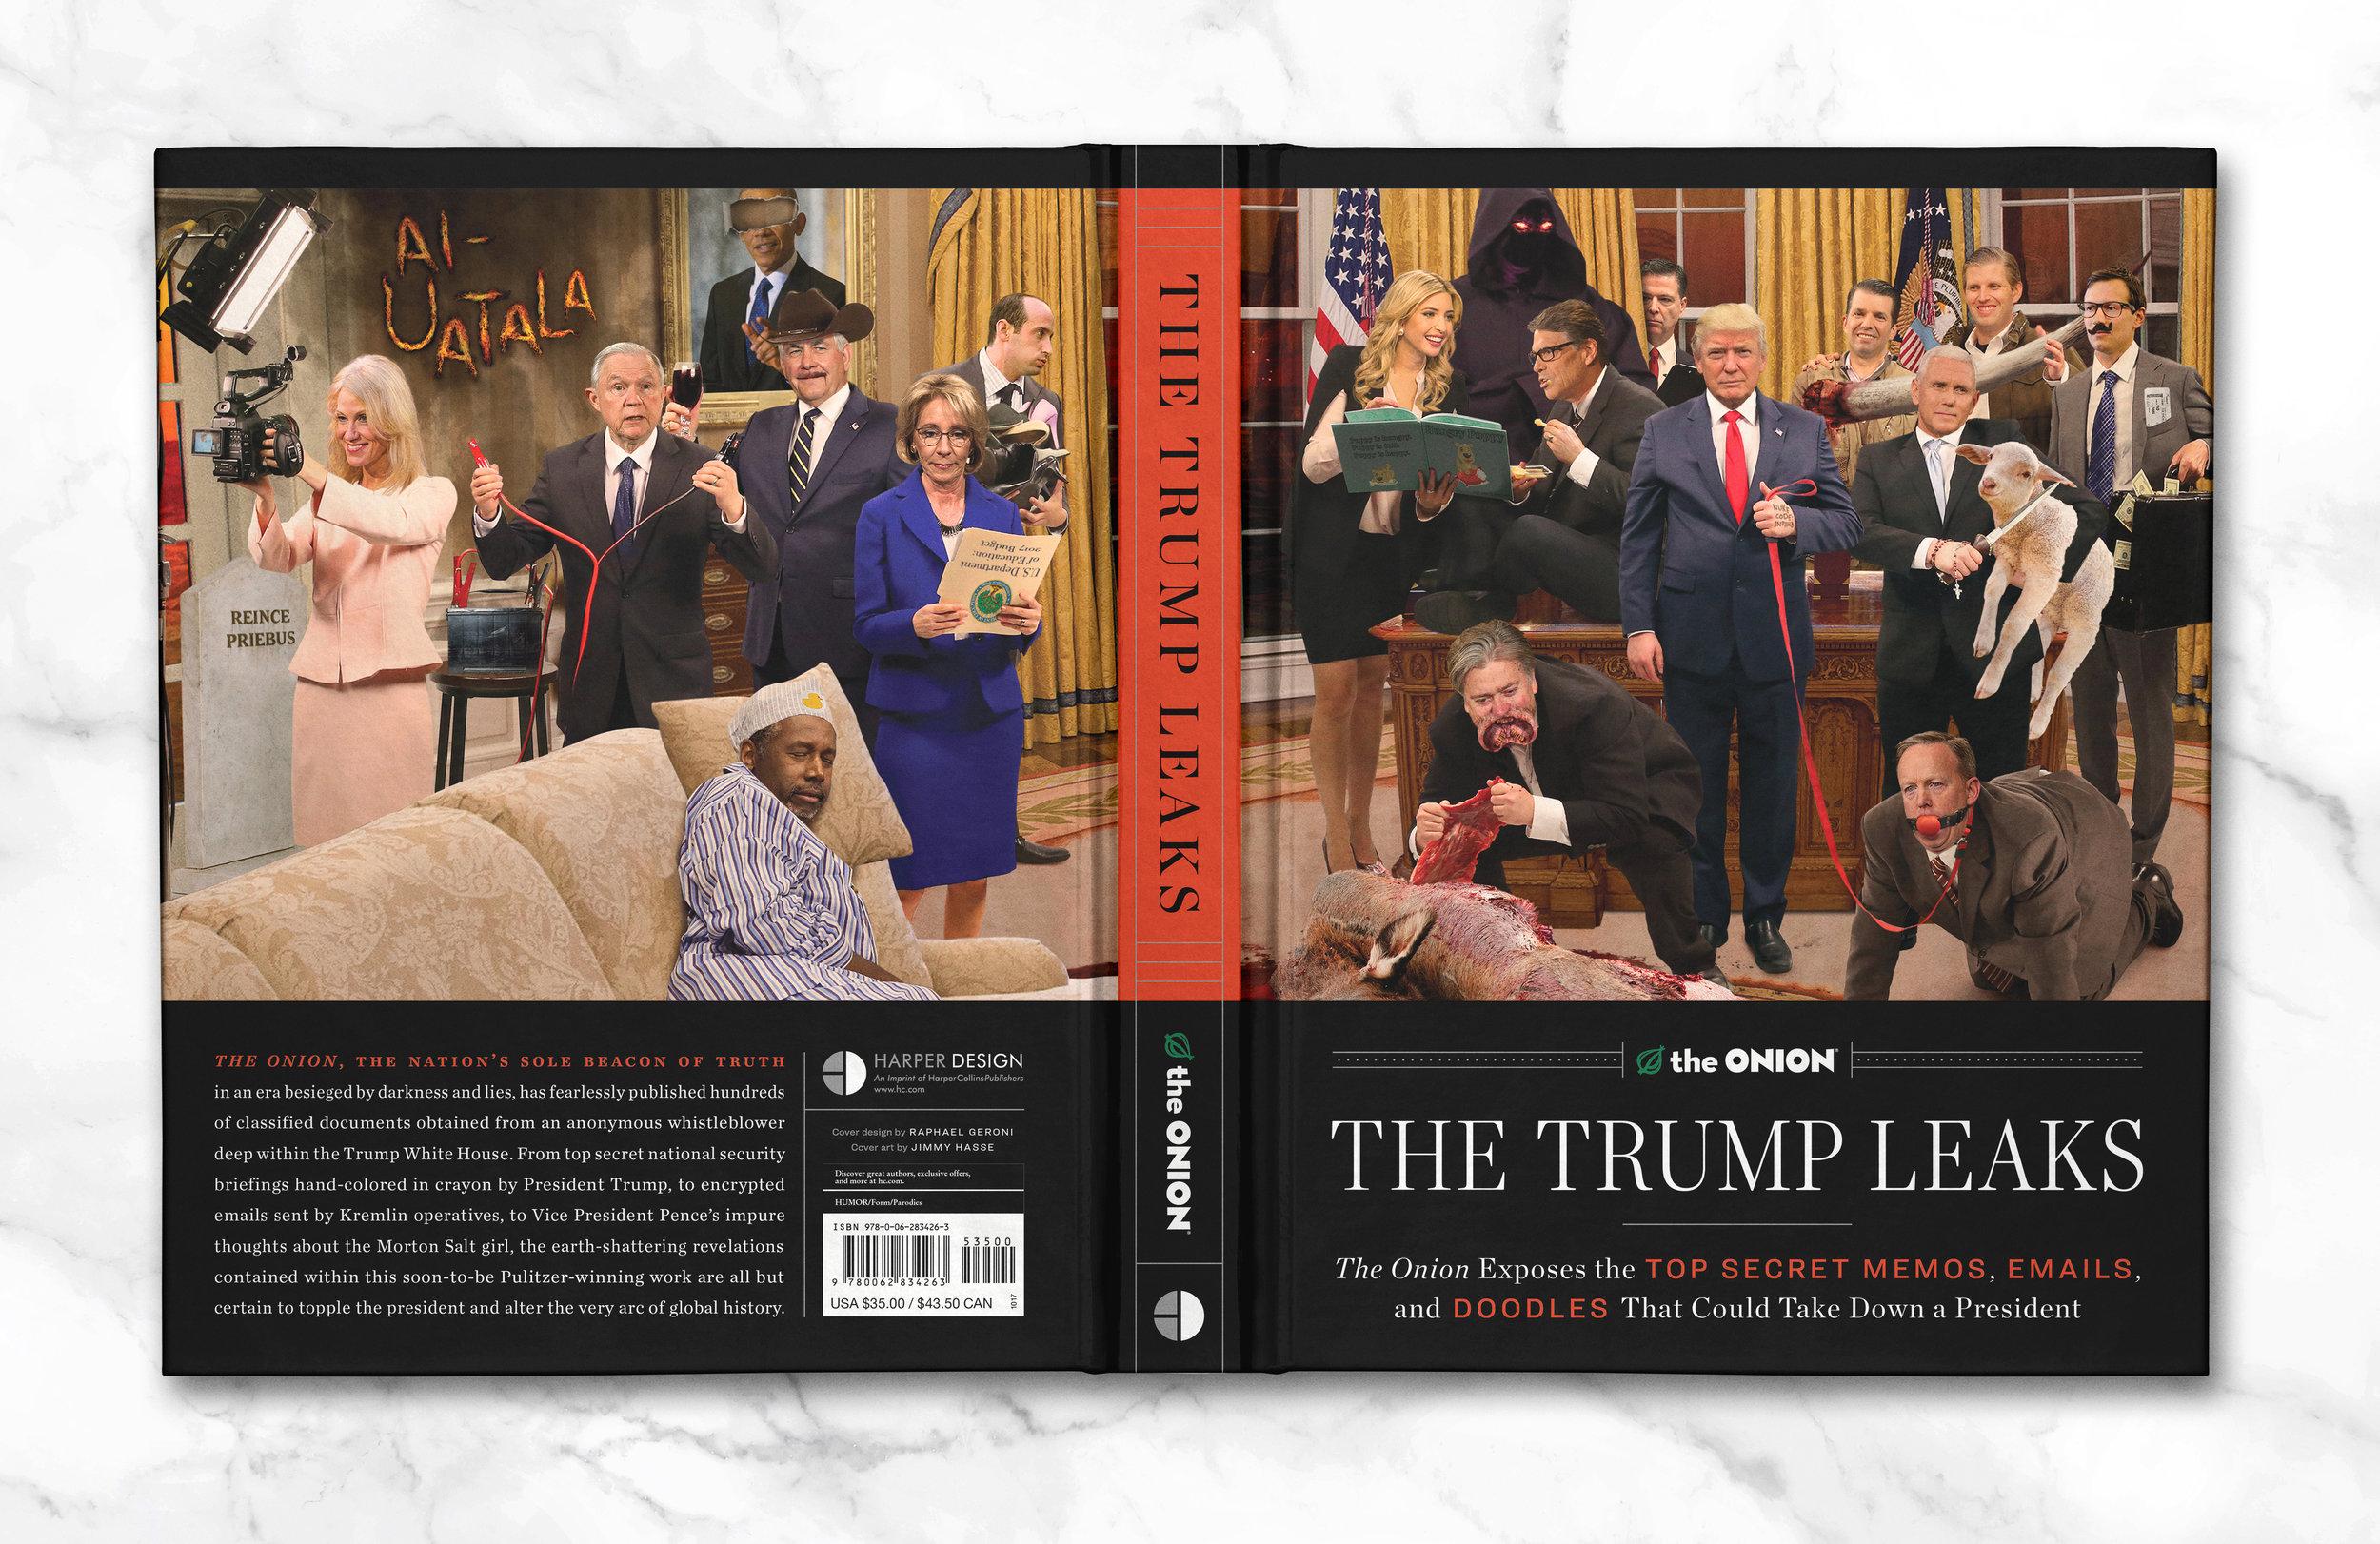 TheTrumpLeaks_Case_RGeroni.jpg